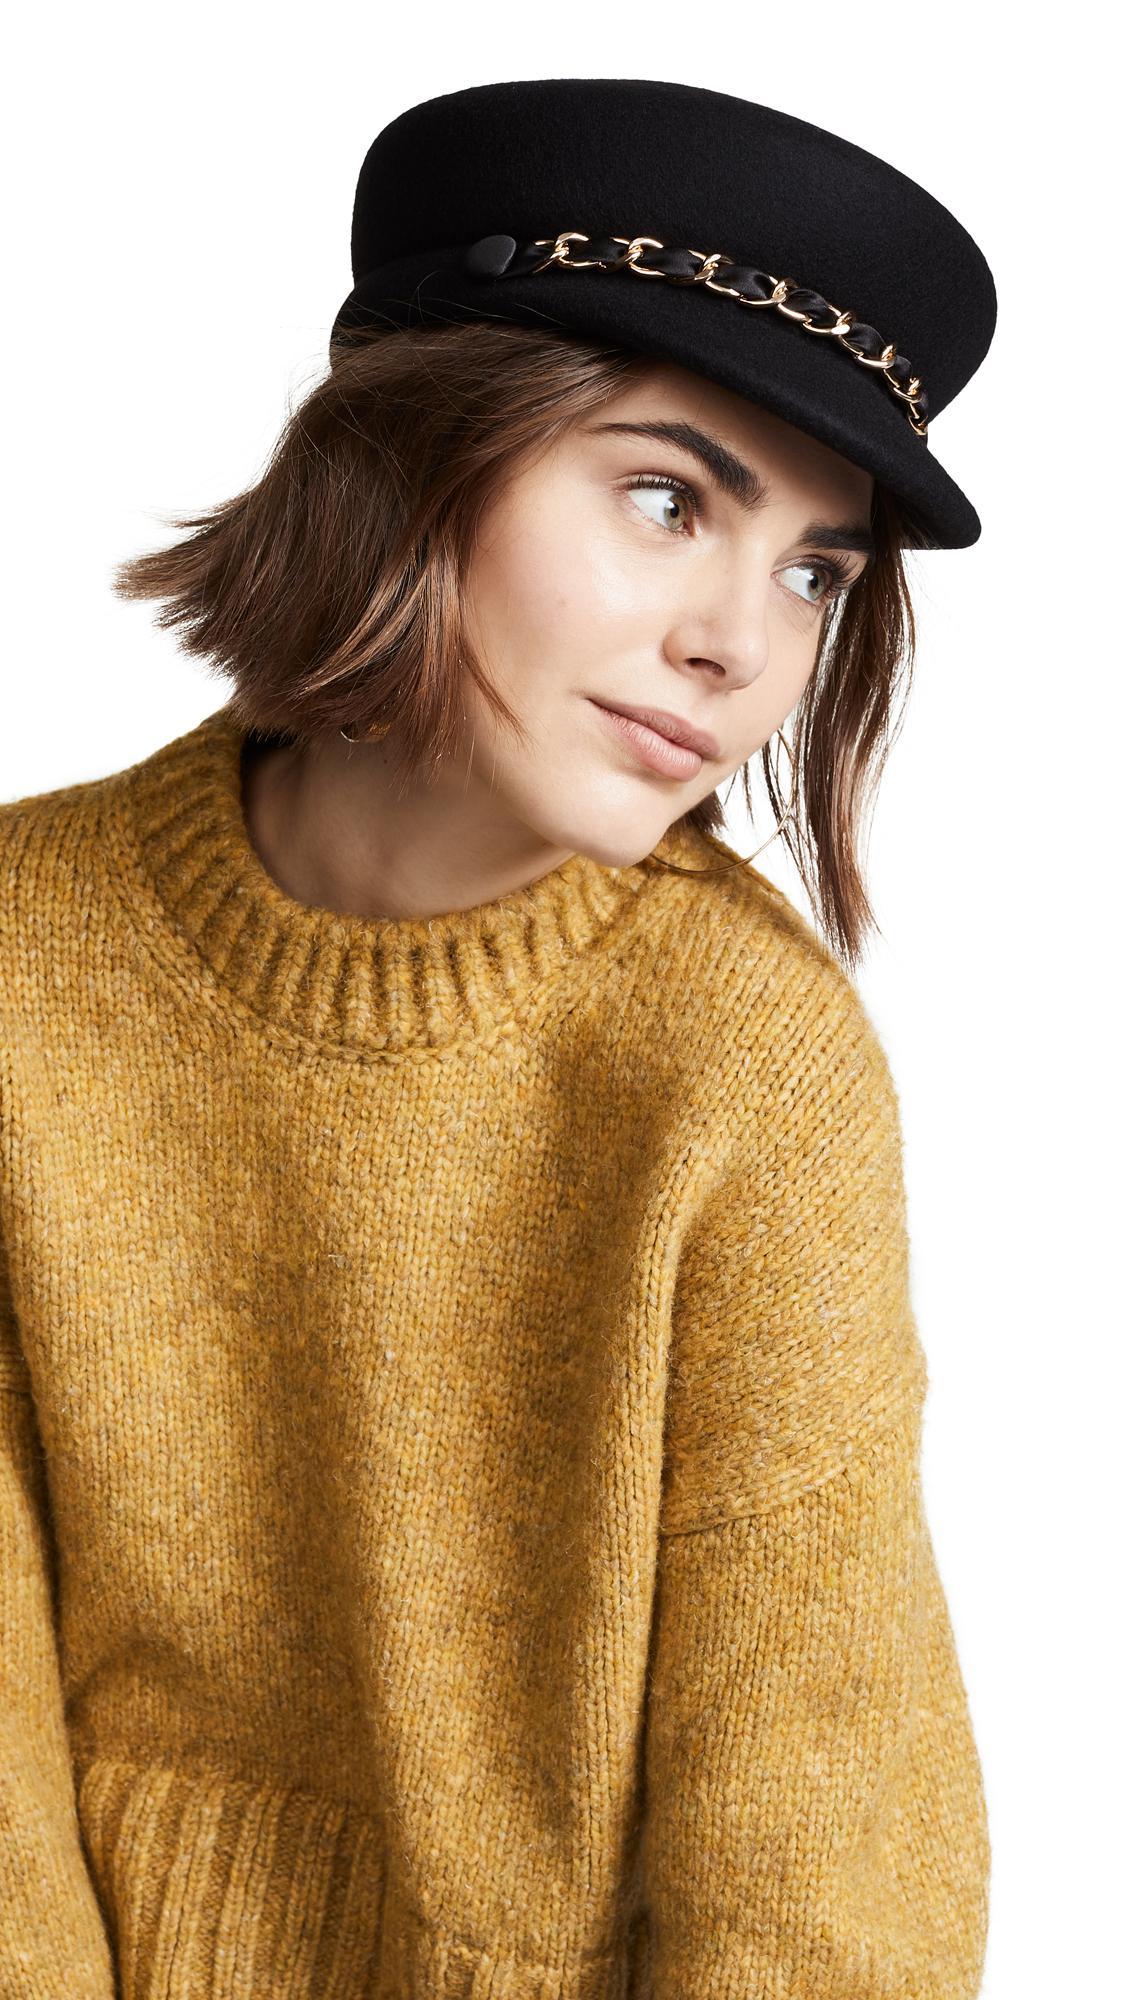 b548982a25d Lyst - Eugenia Kim Sabrina Hat in Black